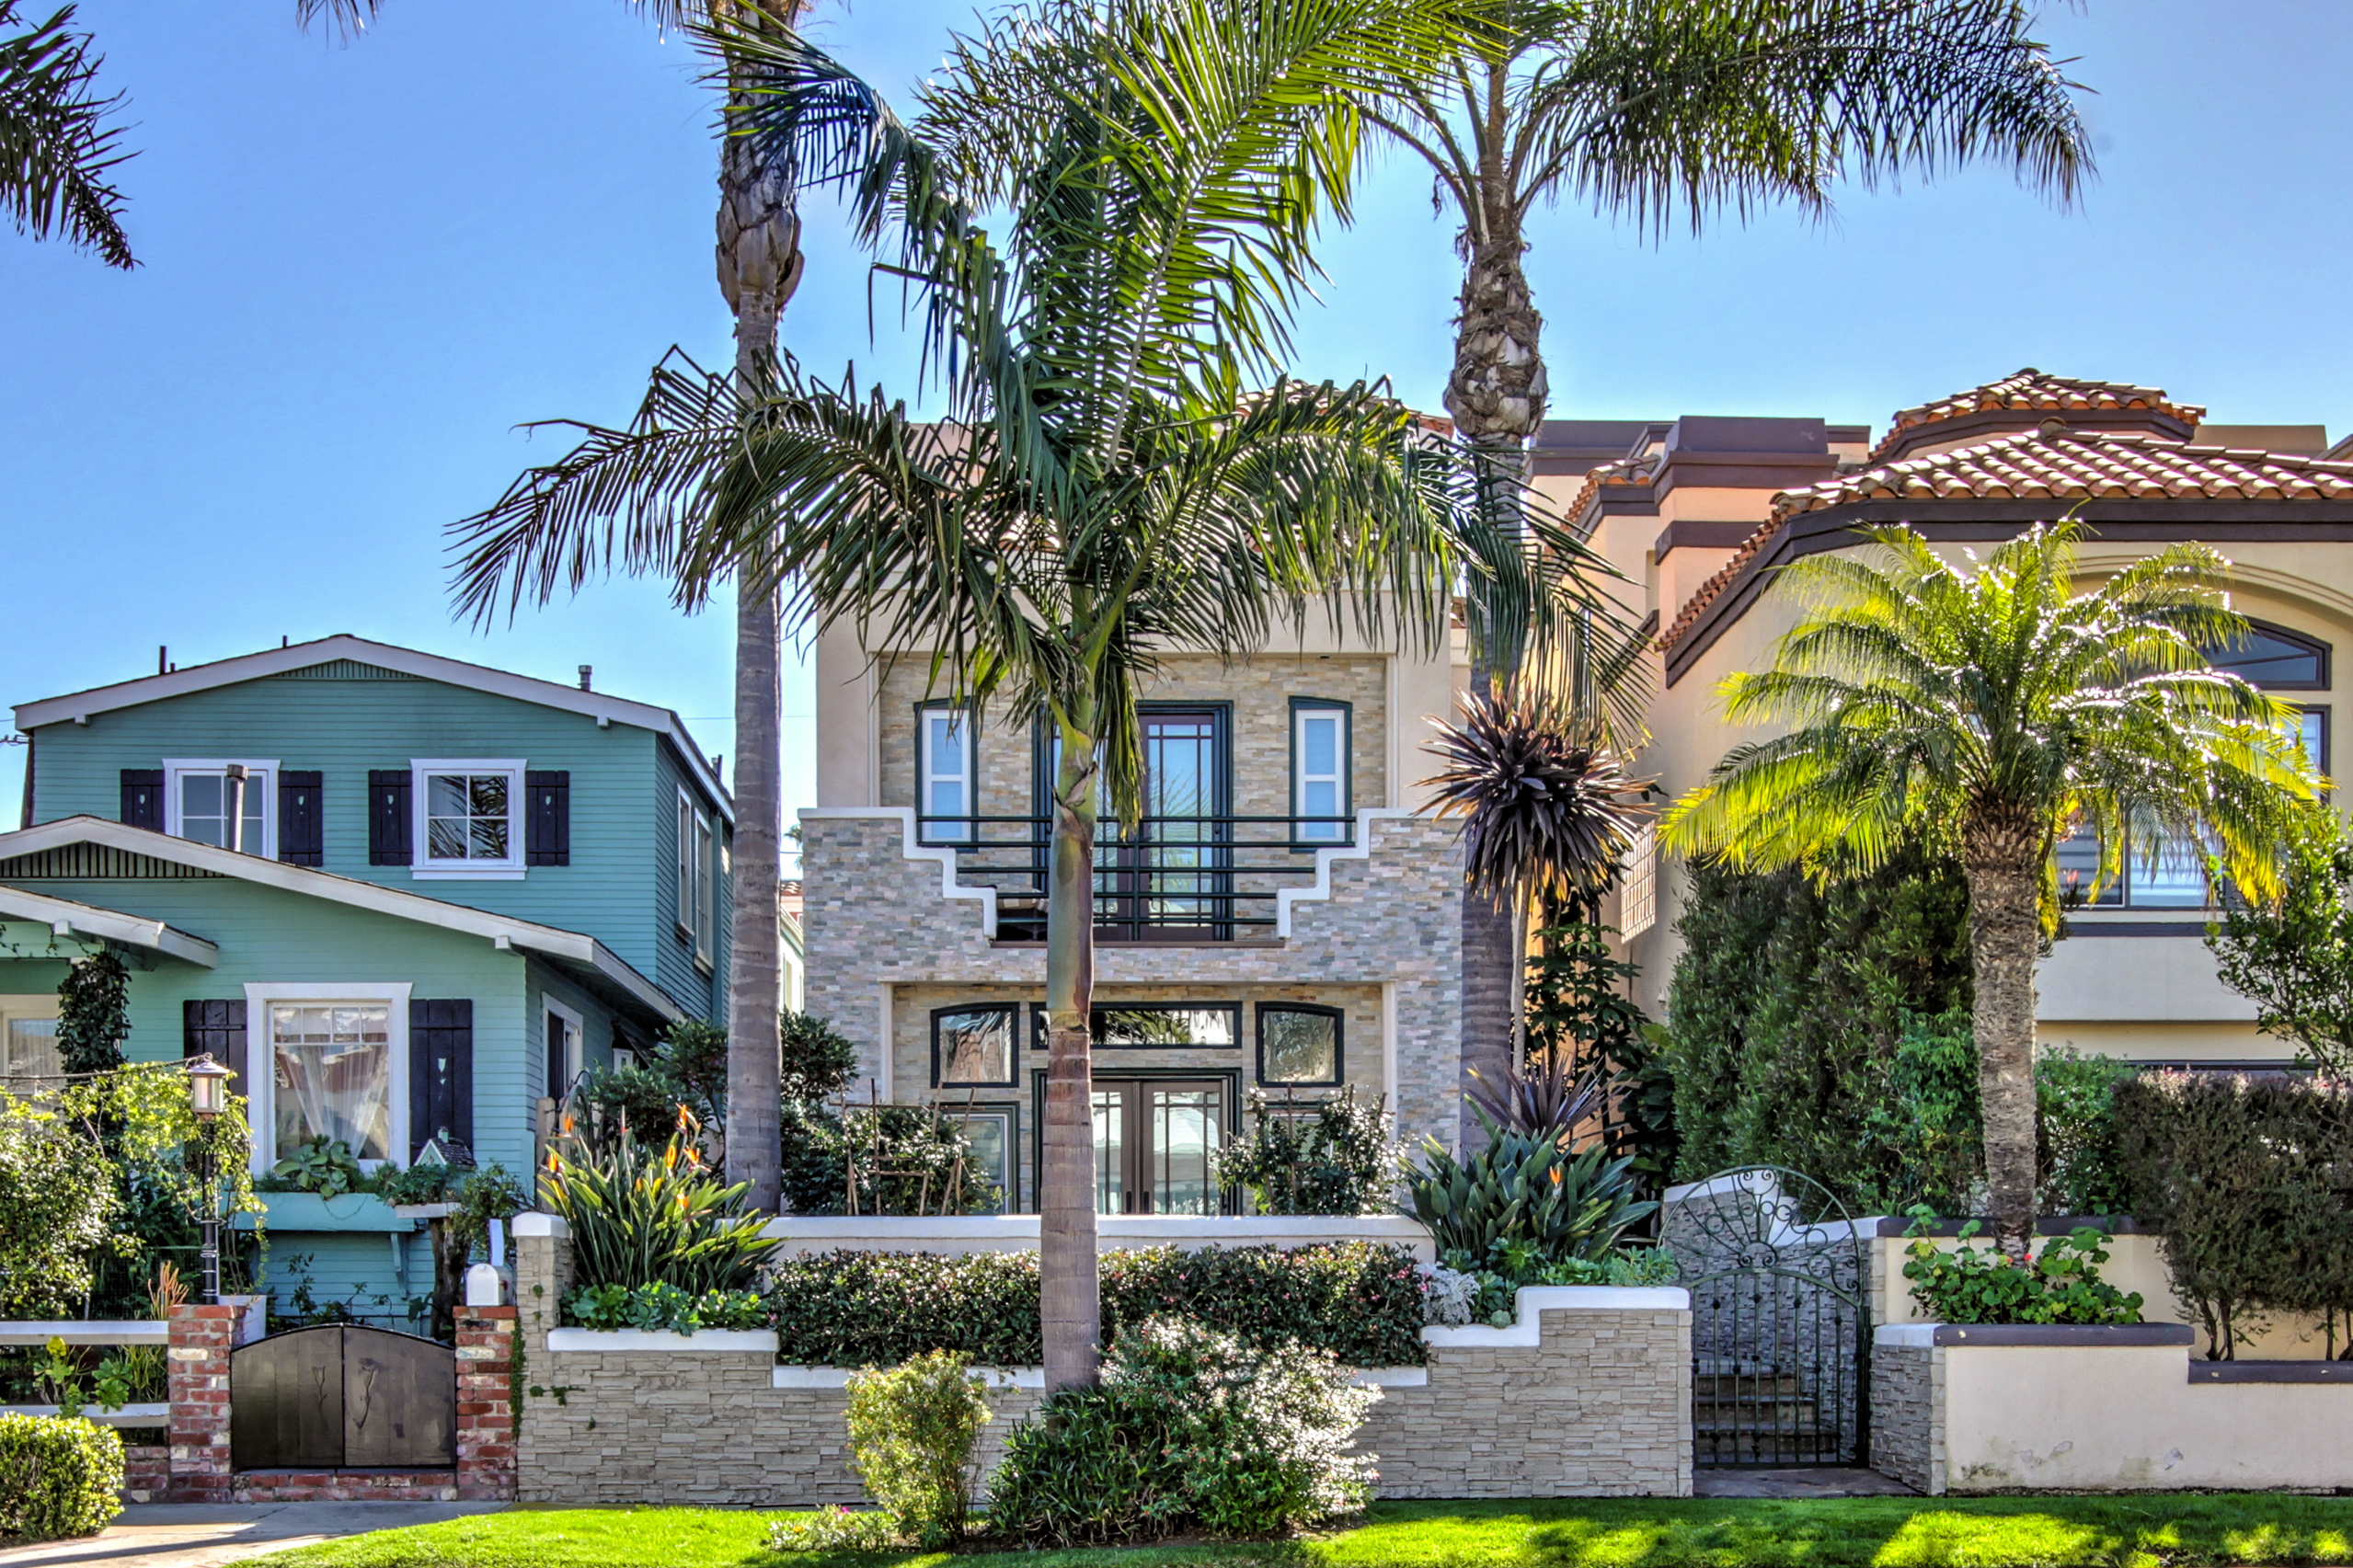 Huntington Beach CA Vacation Rental Welcome to Huntington